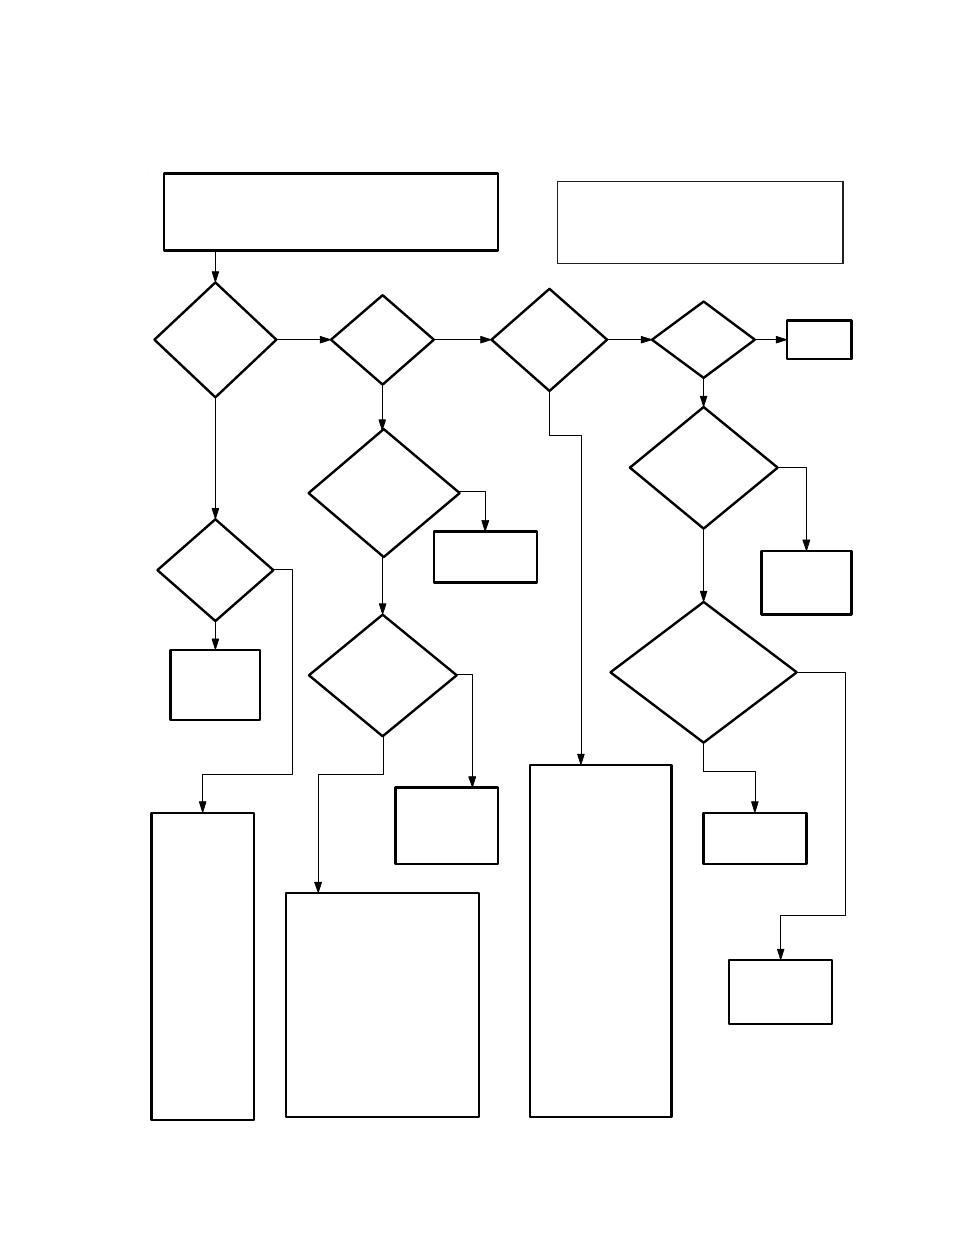 hight resolution of crown boiler wiring diagram wiring diagram tutorial parker boiler wiring diagram crown boiler bsi103 user manual